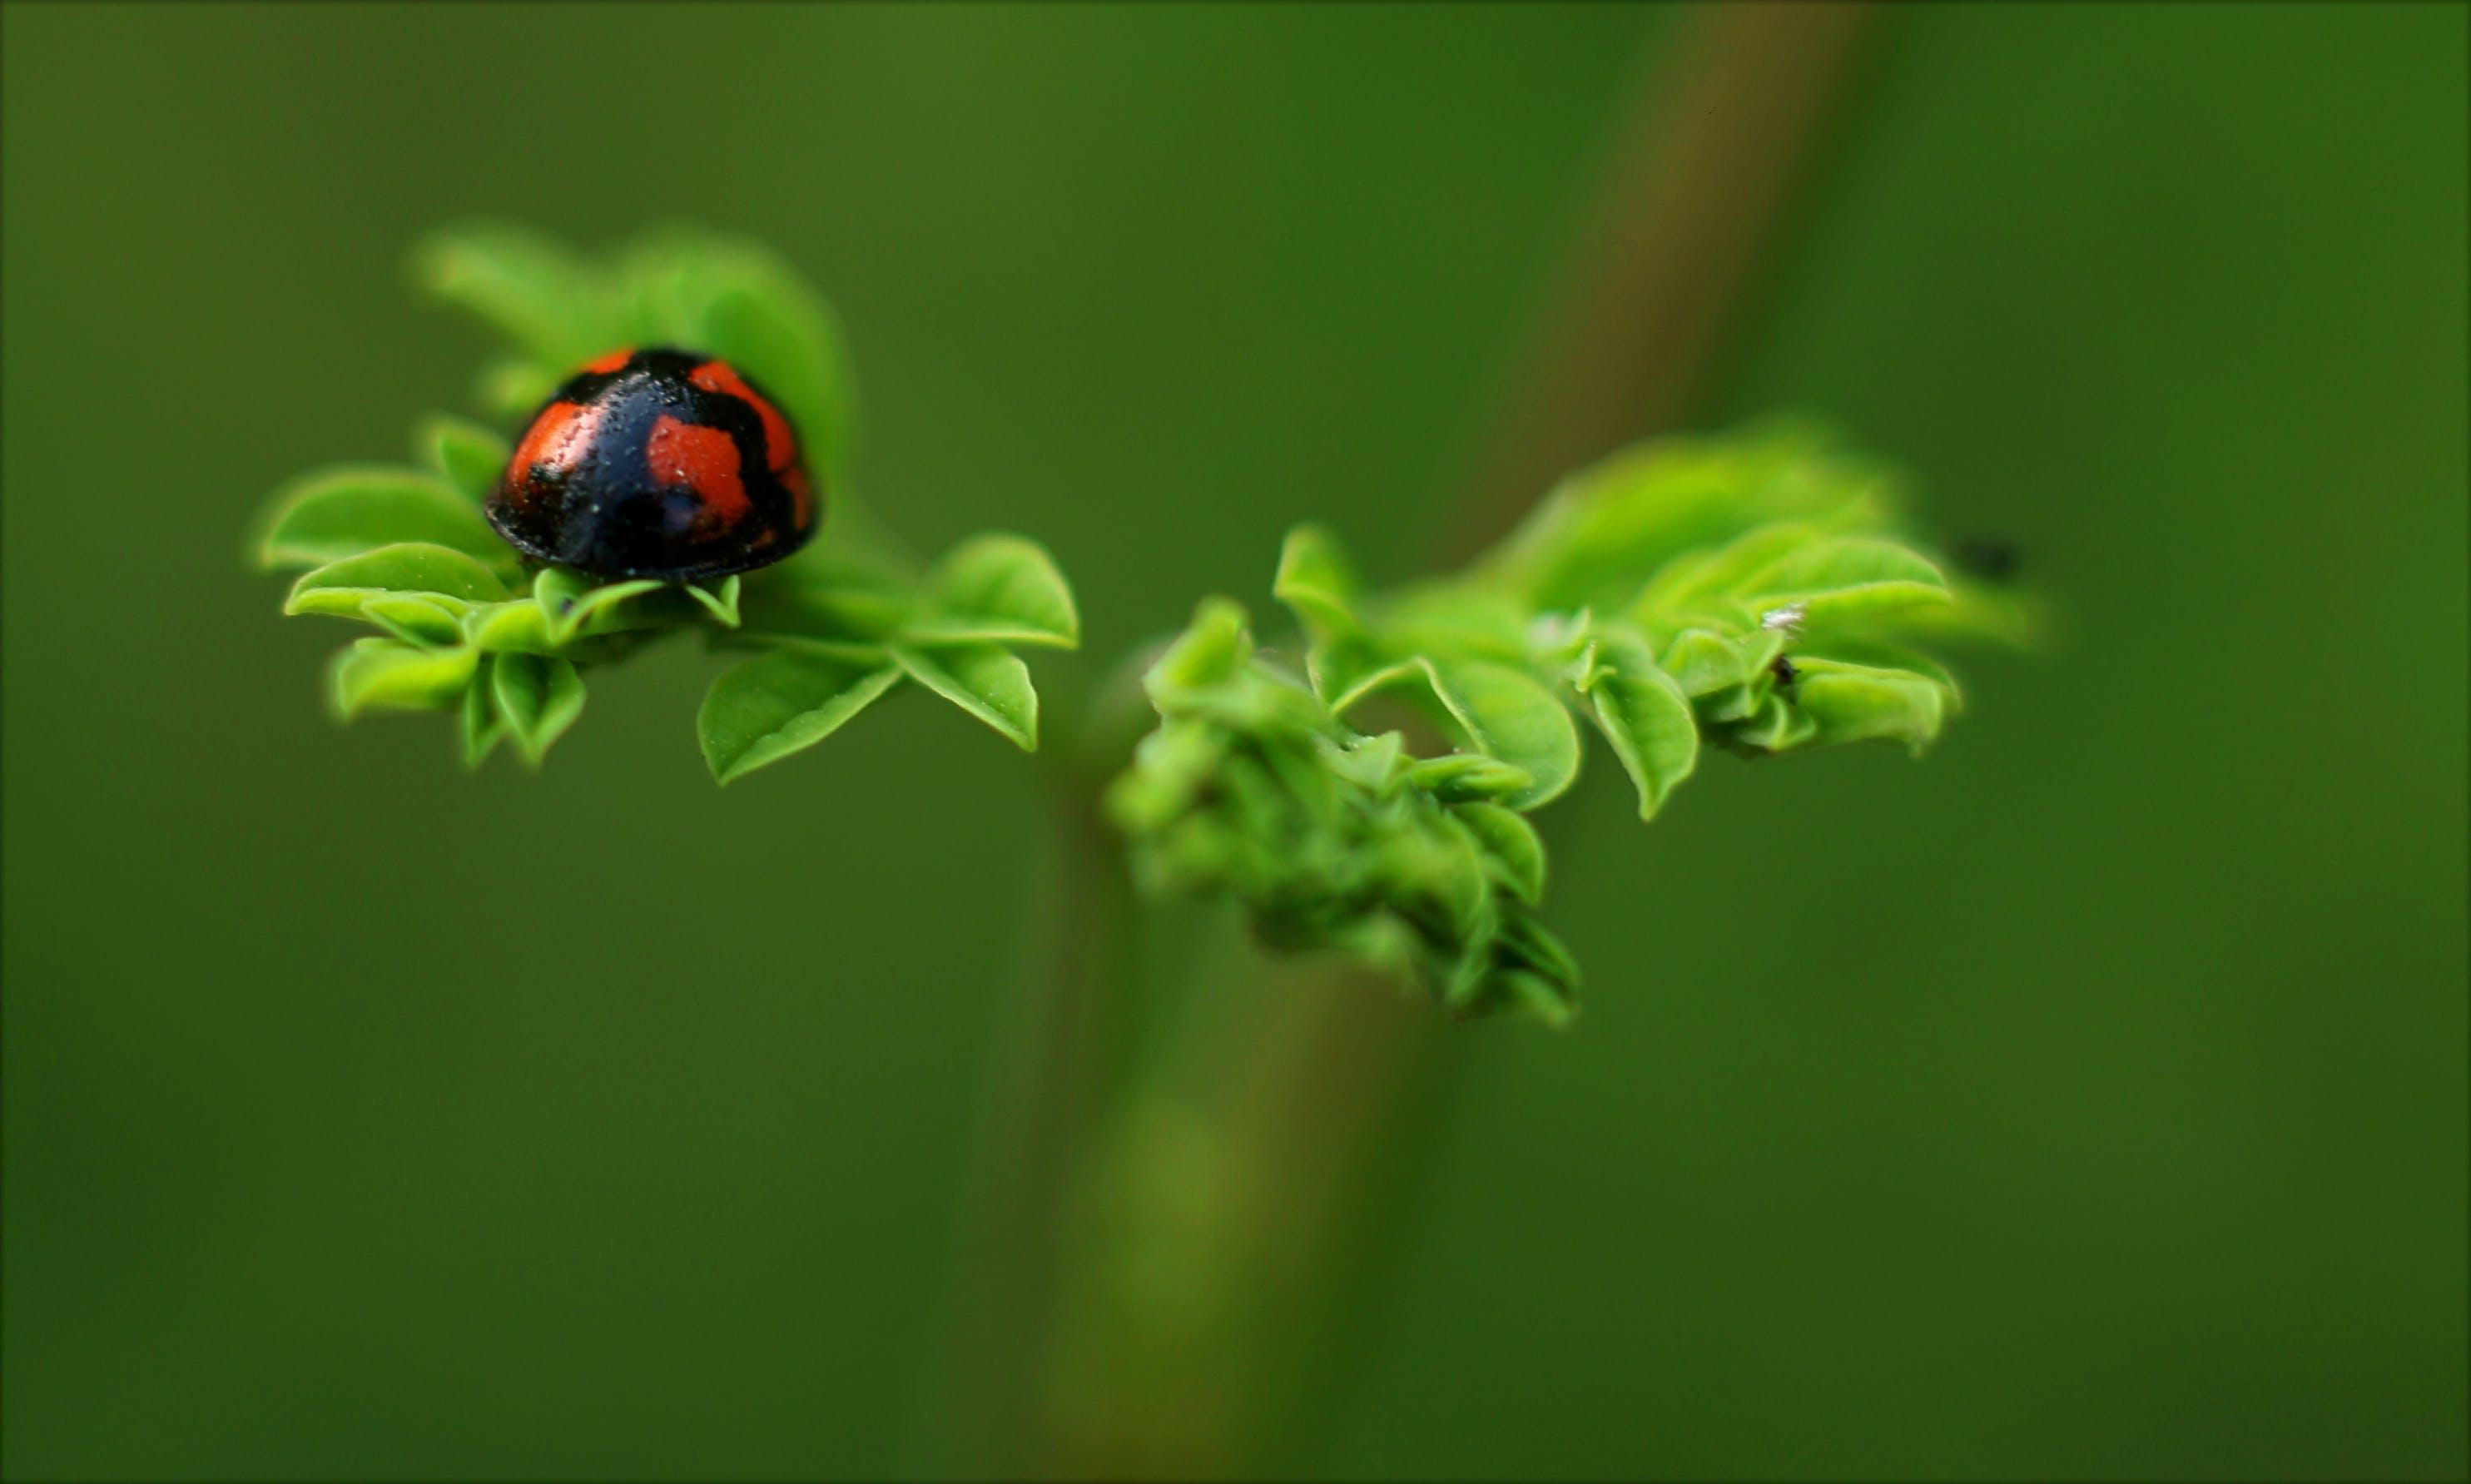 Selective Focus Photography of Ladybug